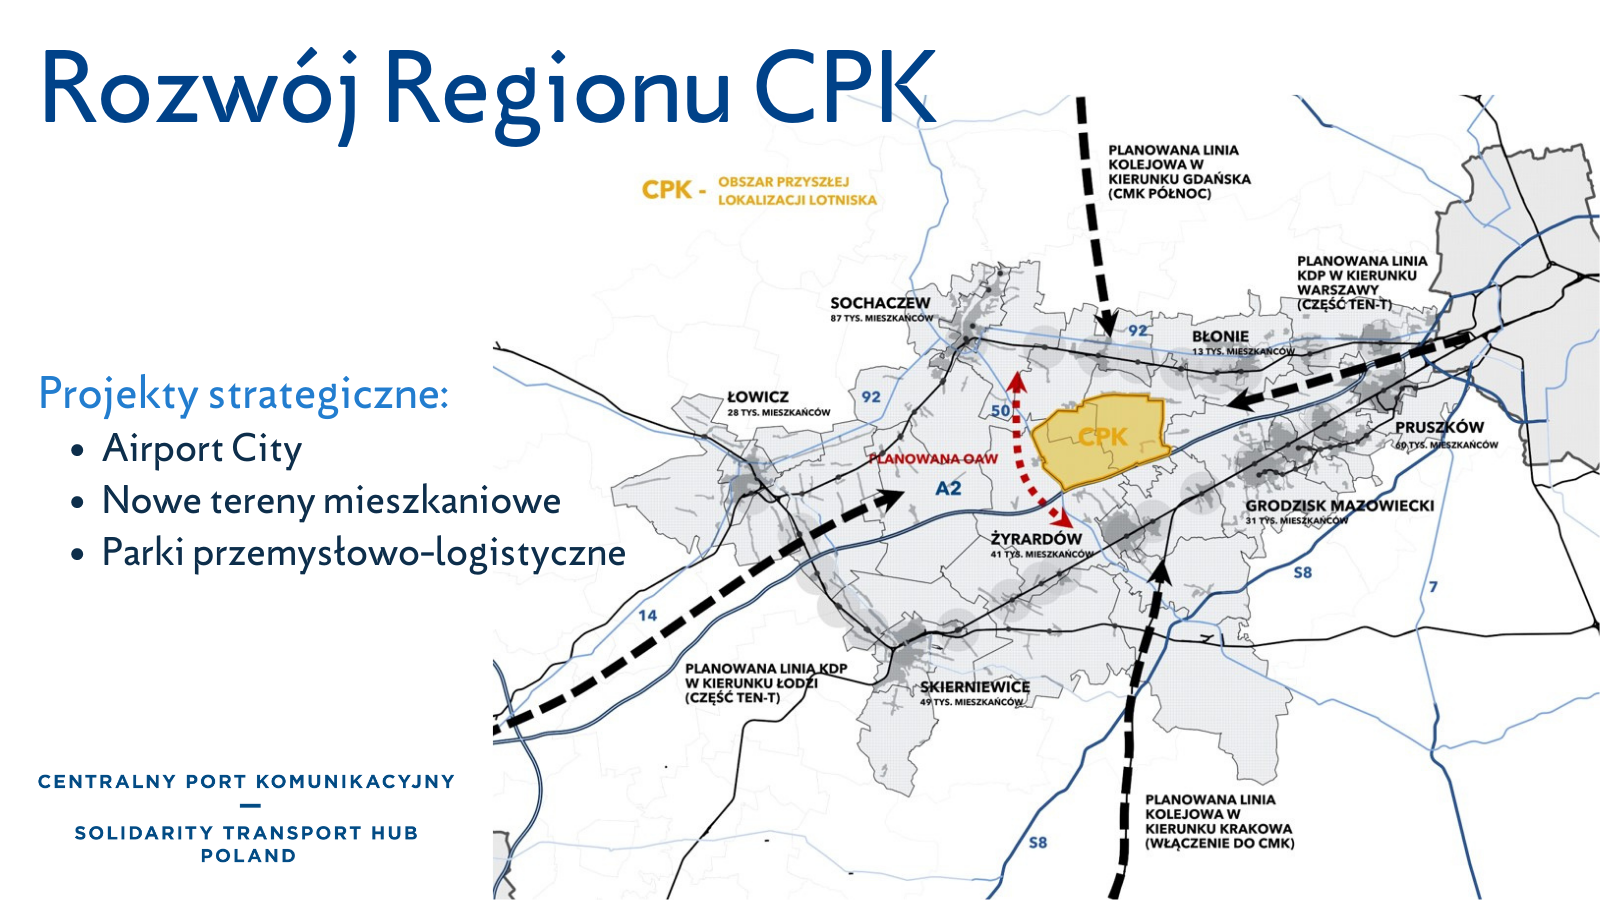 region-cpk-1-twiter-18122020